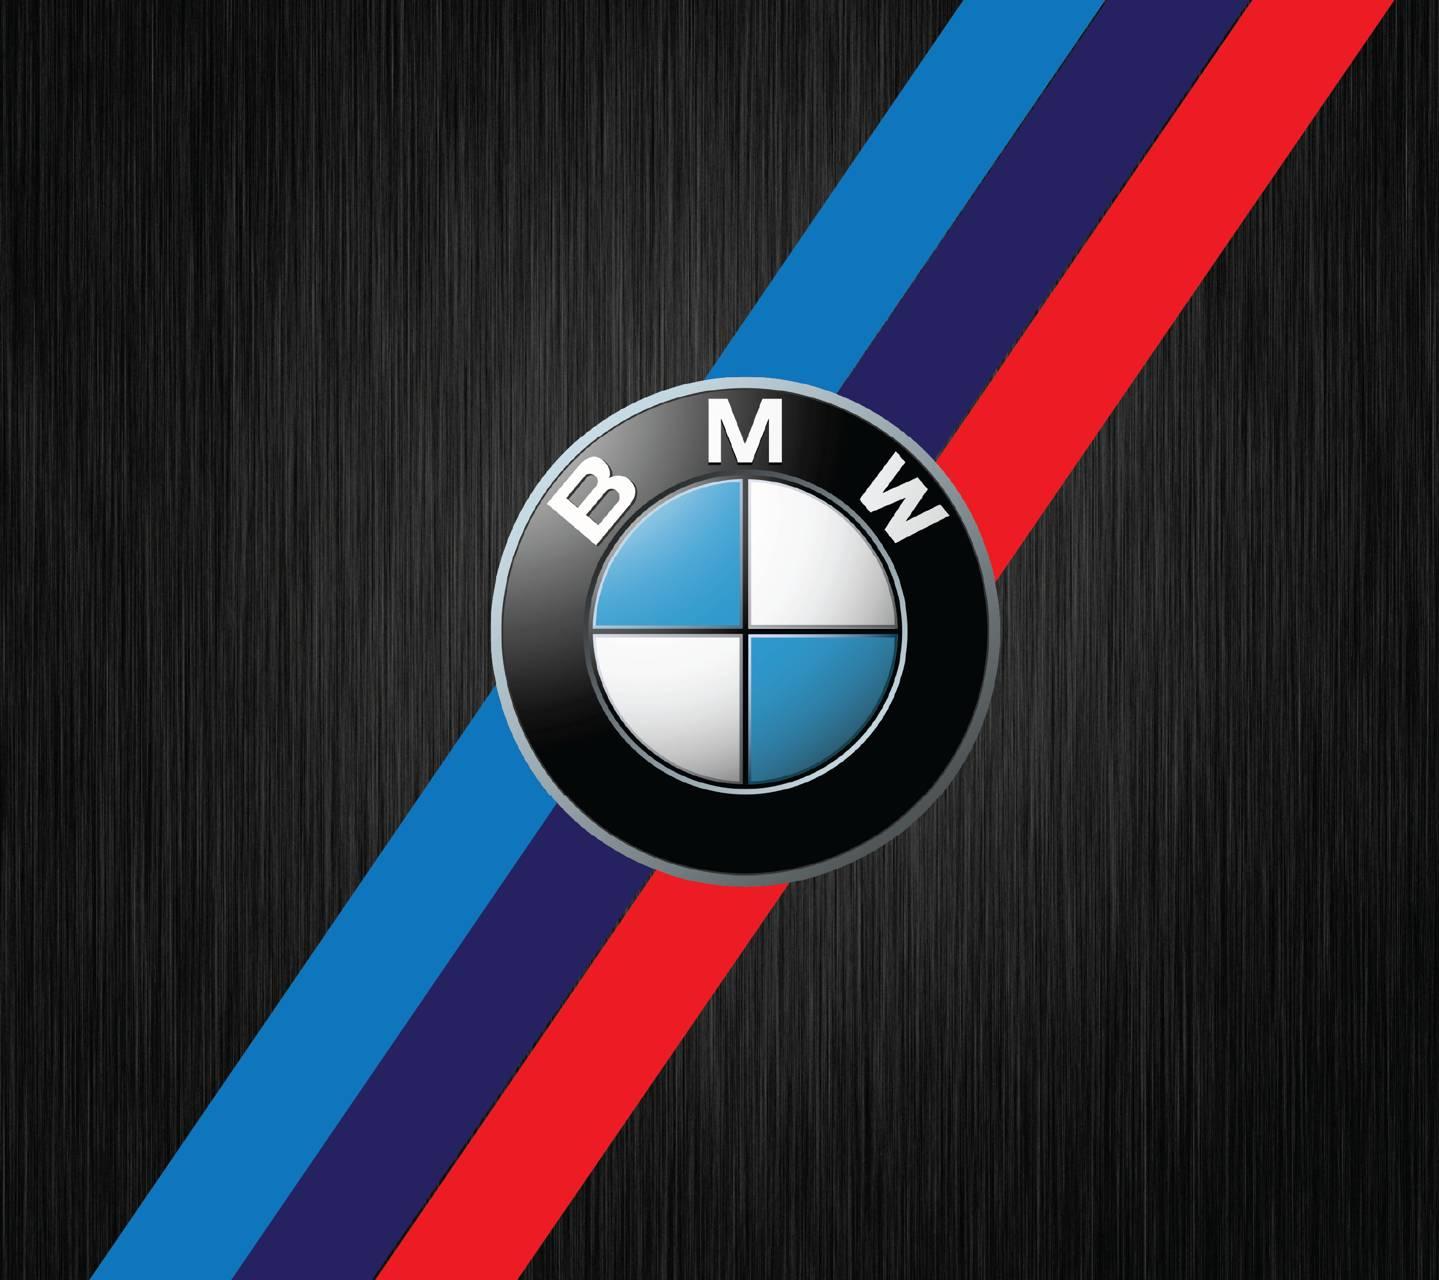 Bmw M Series Wallpaper By Jamesluce2 83 Free On Zedge